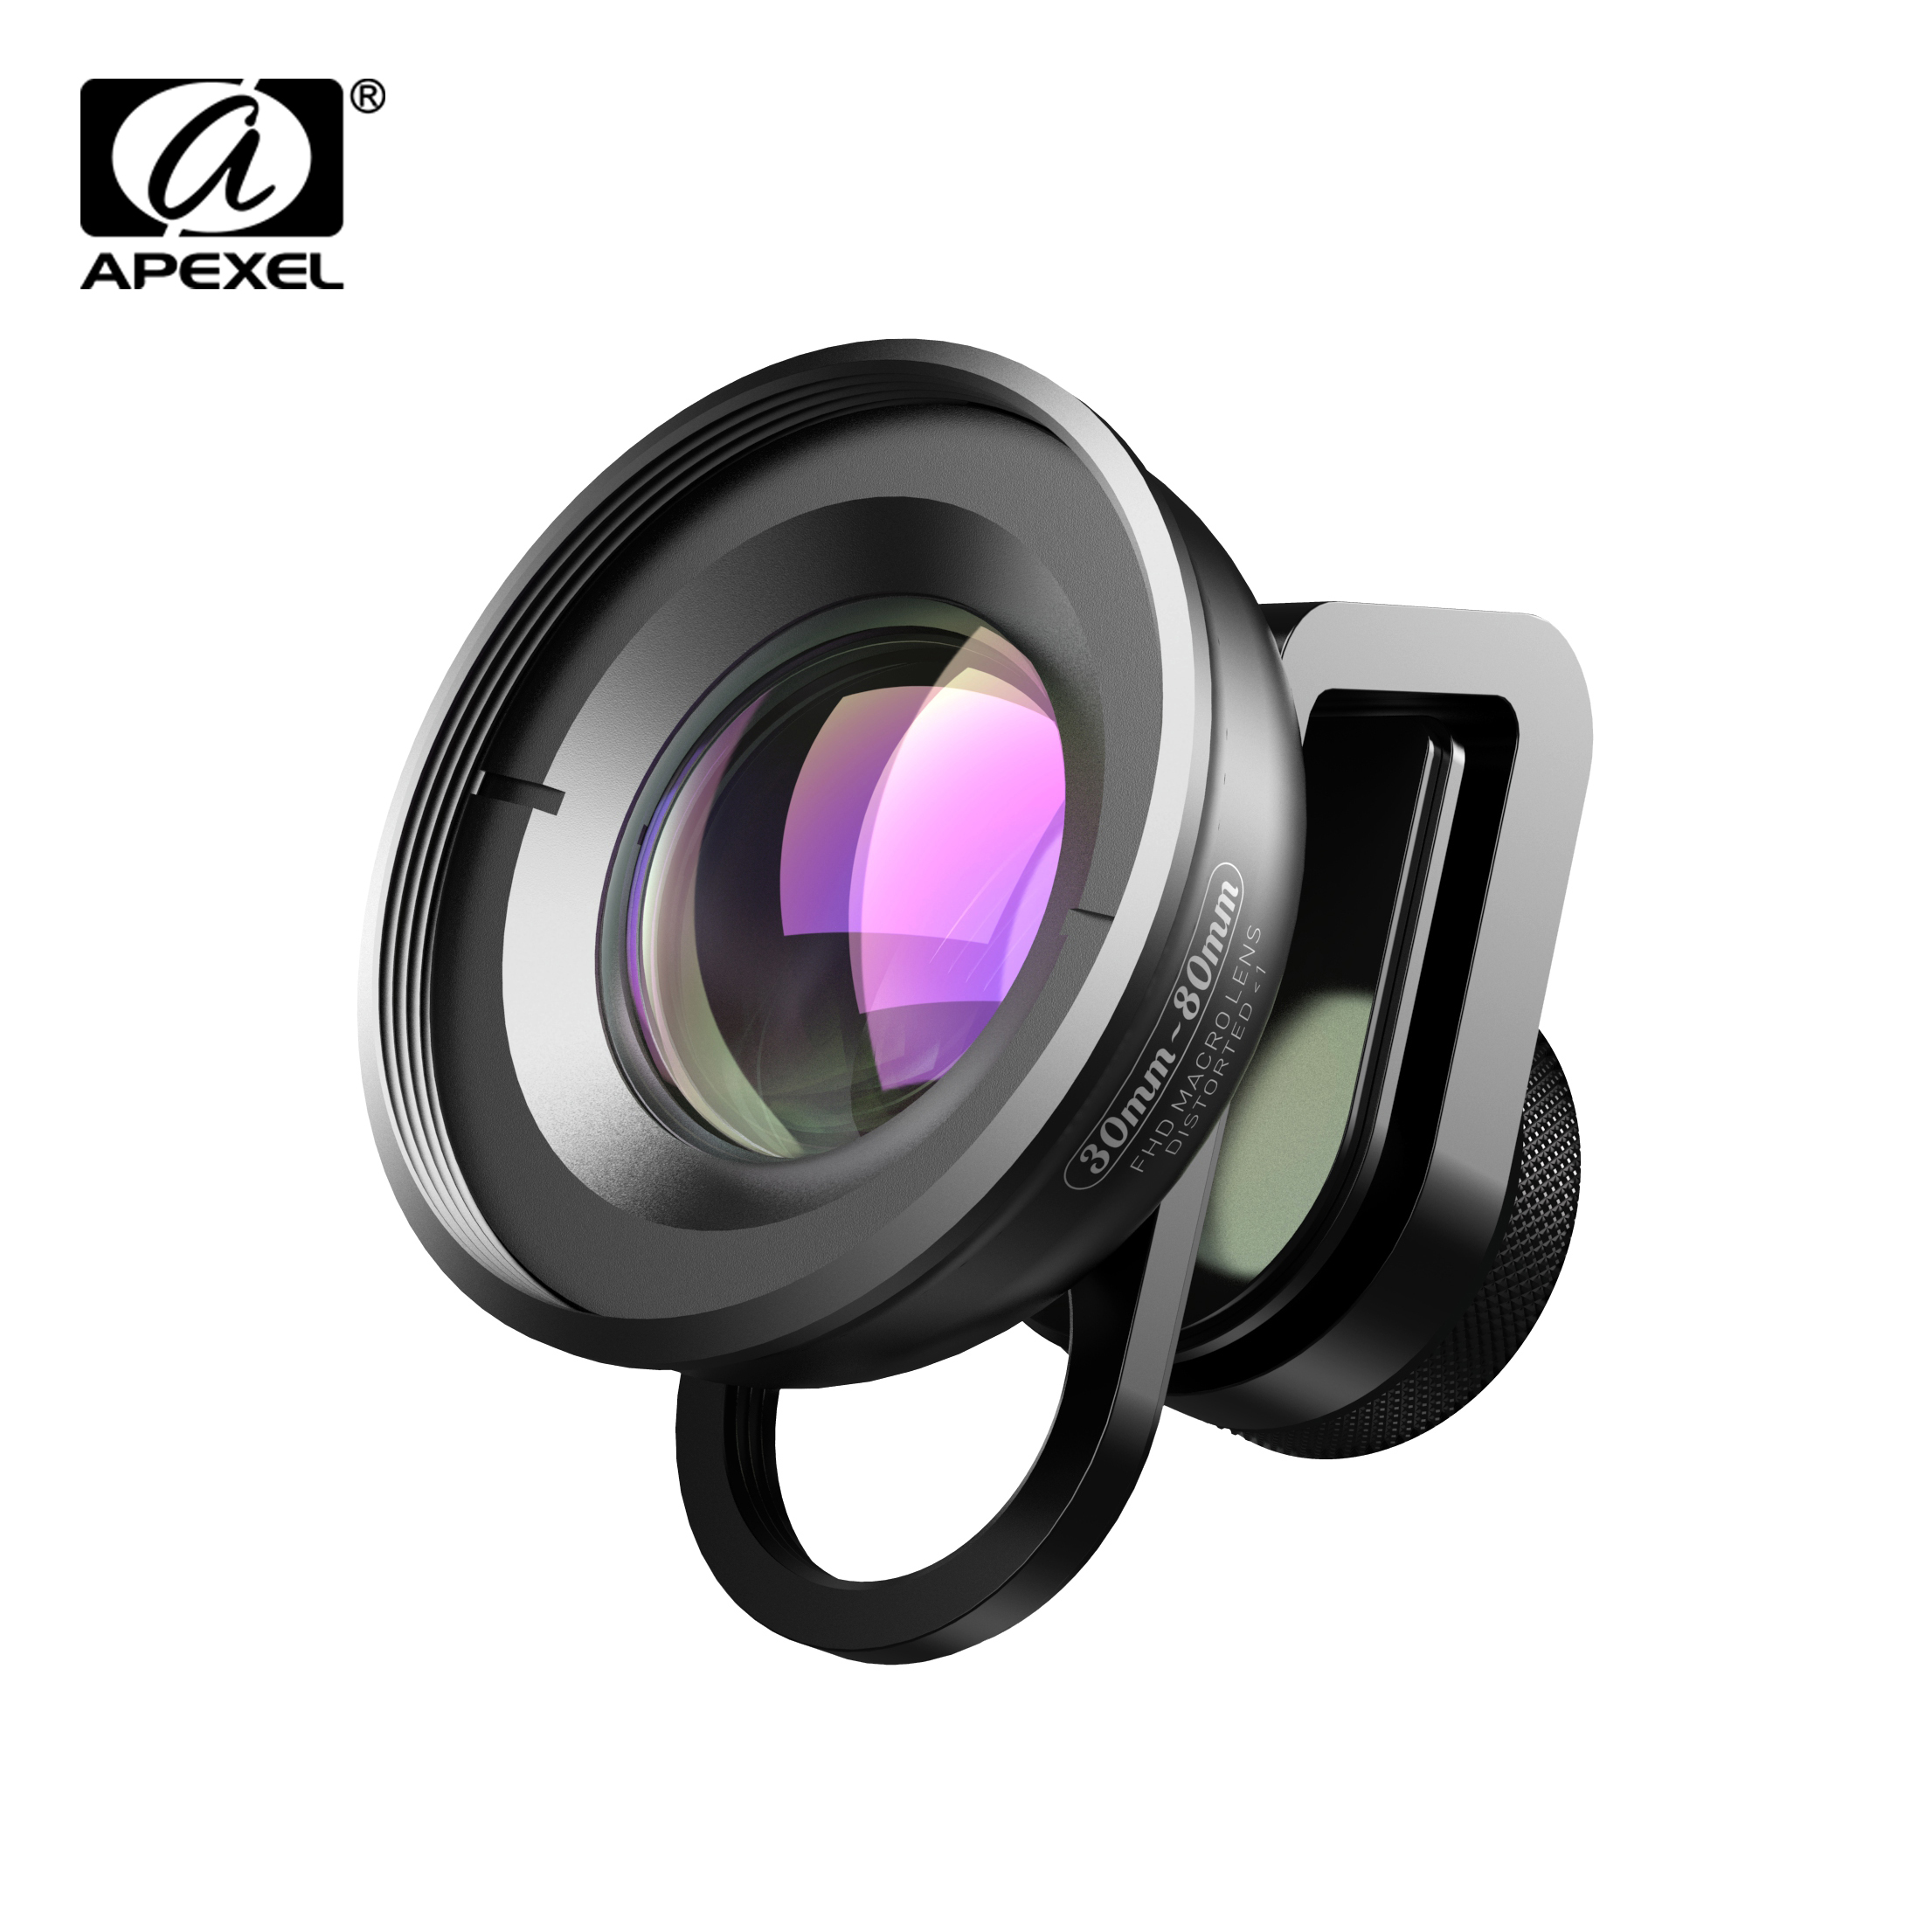 APEXEL HD Optic 30mm-80mm Macro Lens Phone Camera Lens 10x Super Macro Lentes for iPhonex xs max Samsung Xiaomi huawei Cellphone